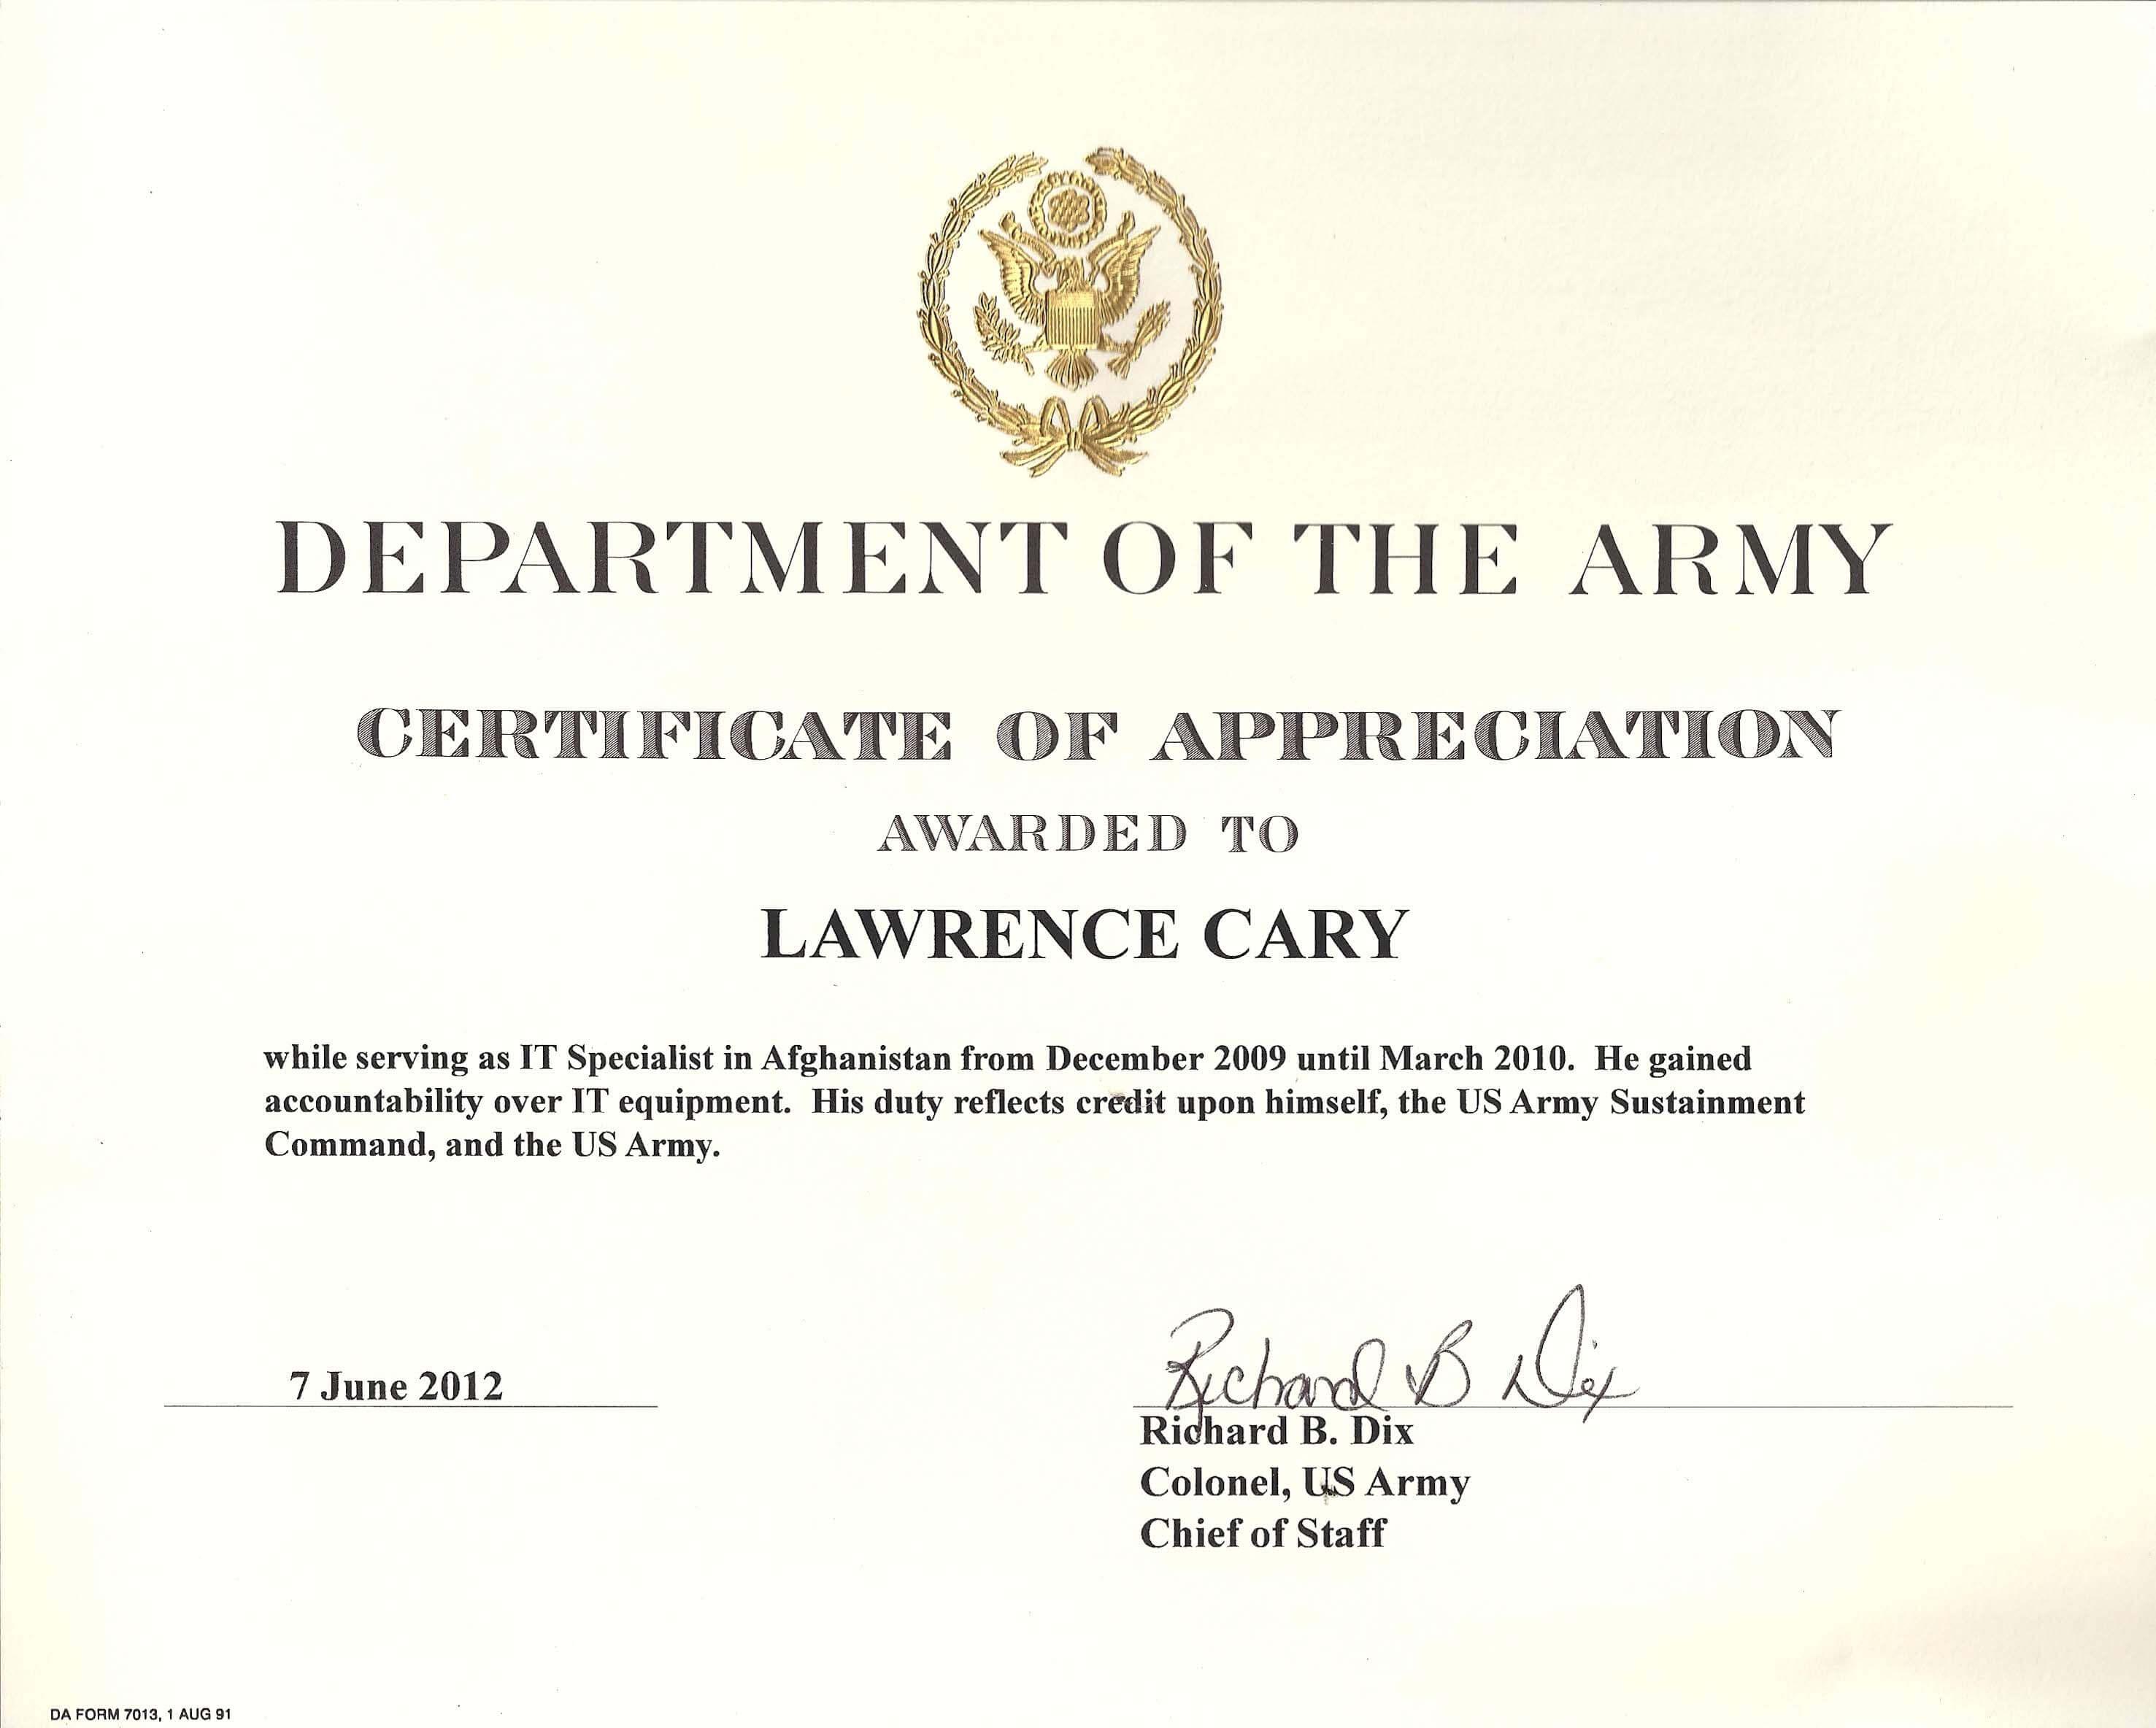 6+ Army Appreciation Certificate Templates - Pdf, Docx For Officer Promotion Certificate Template